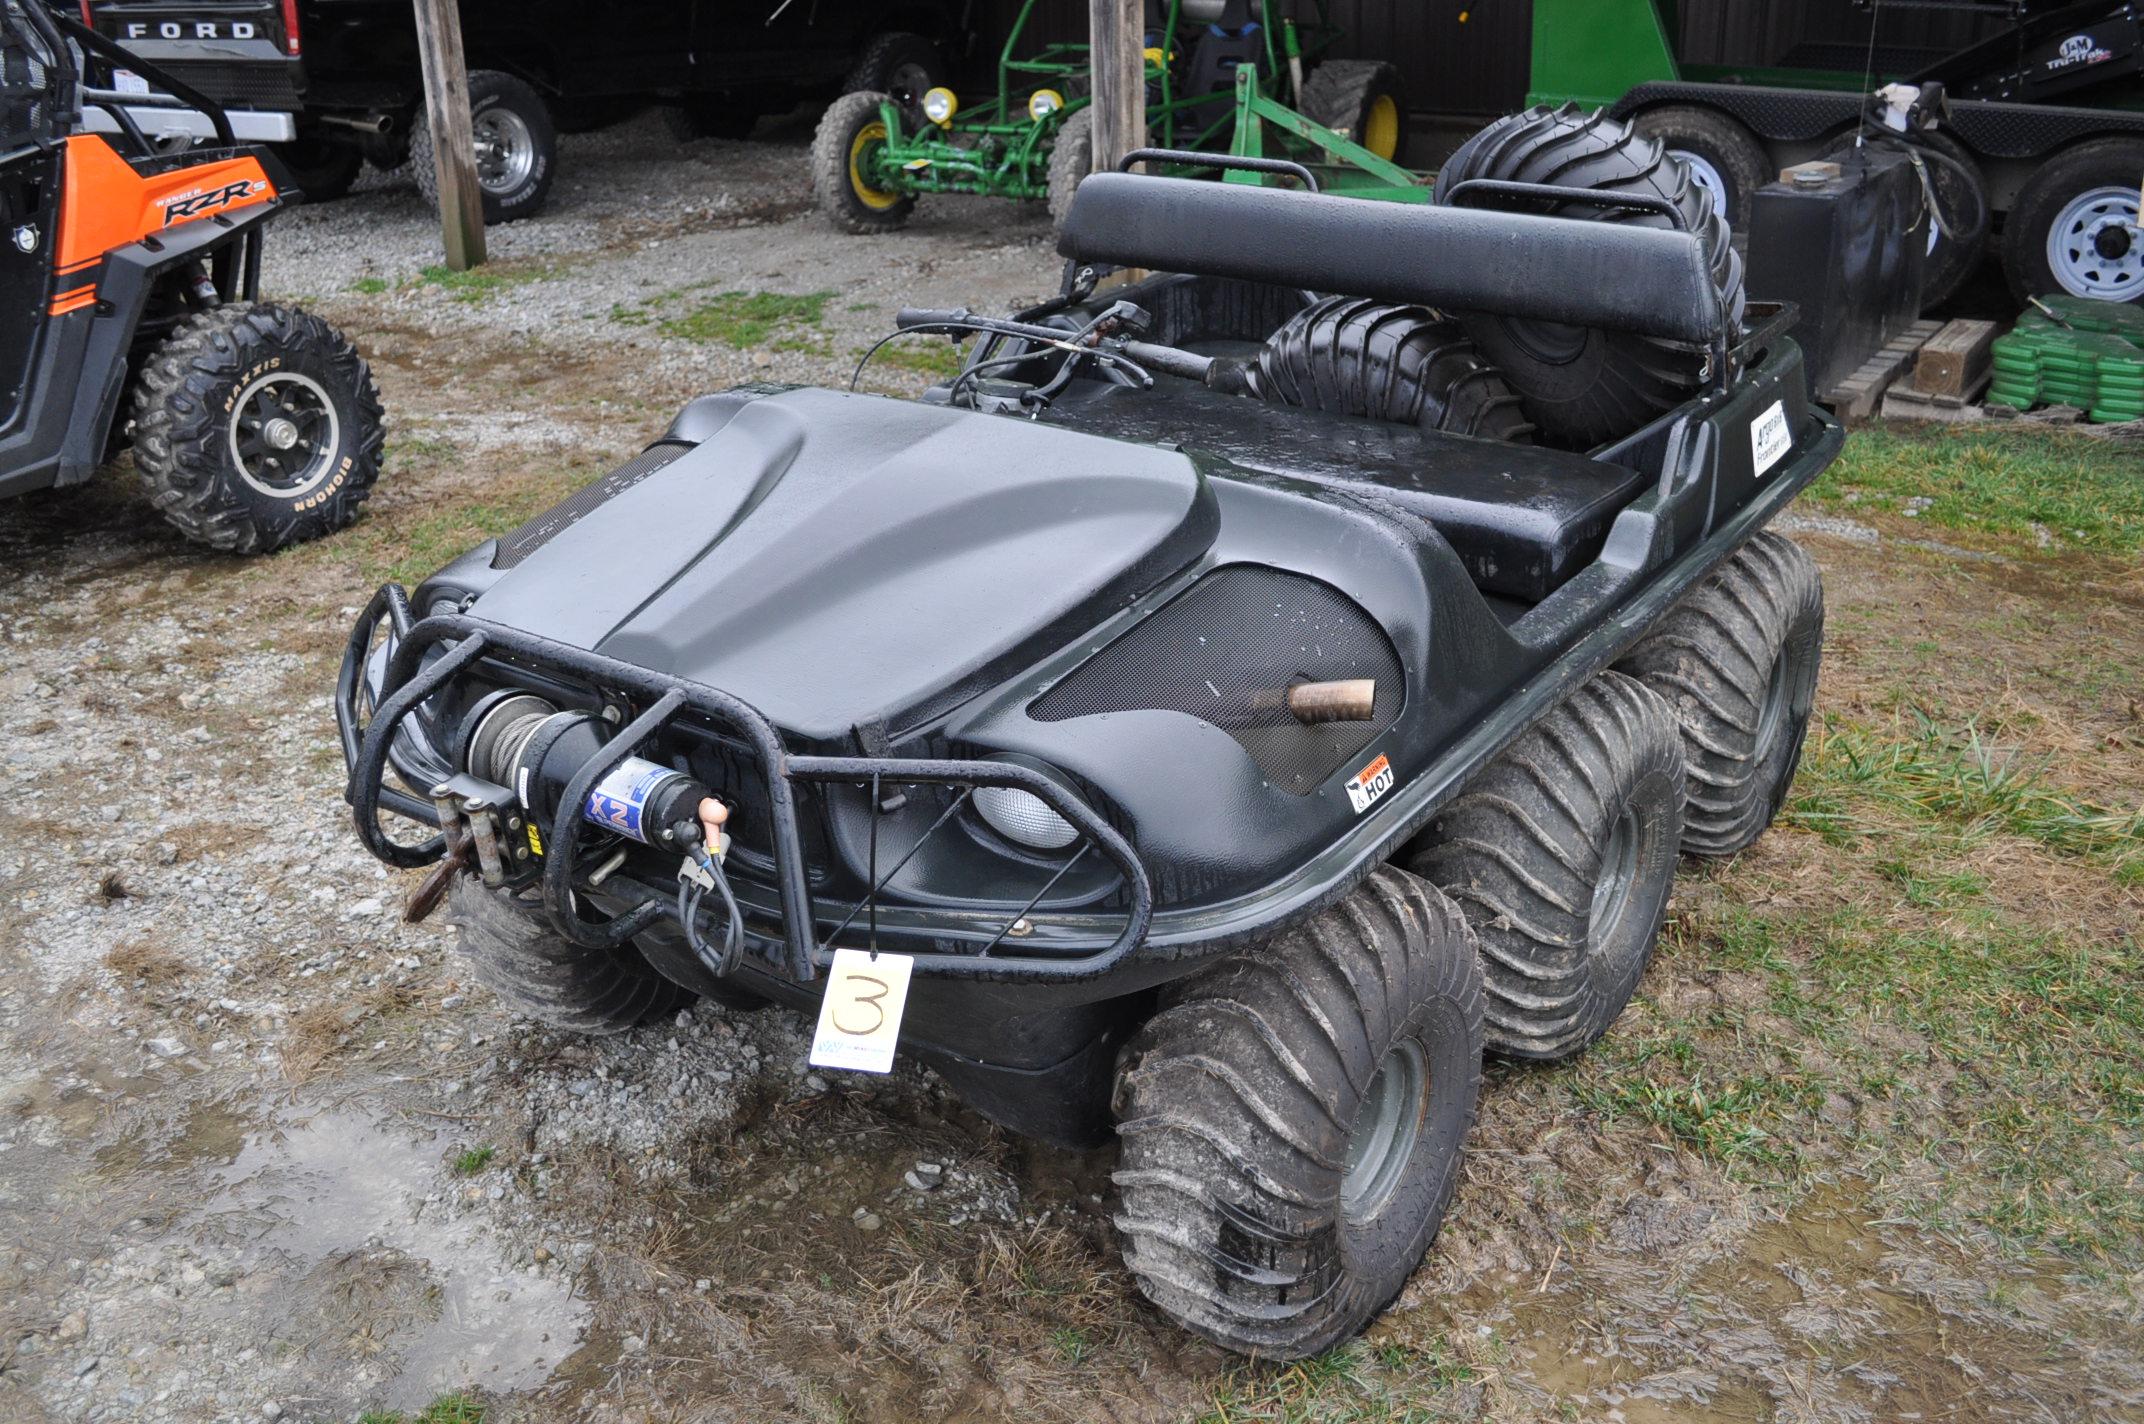 2008 Argo Frontier 650 6x6 ATV, 24 x 10.00-8 tires, 256 hrs